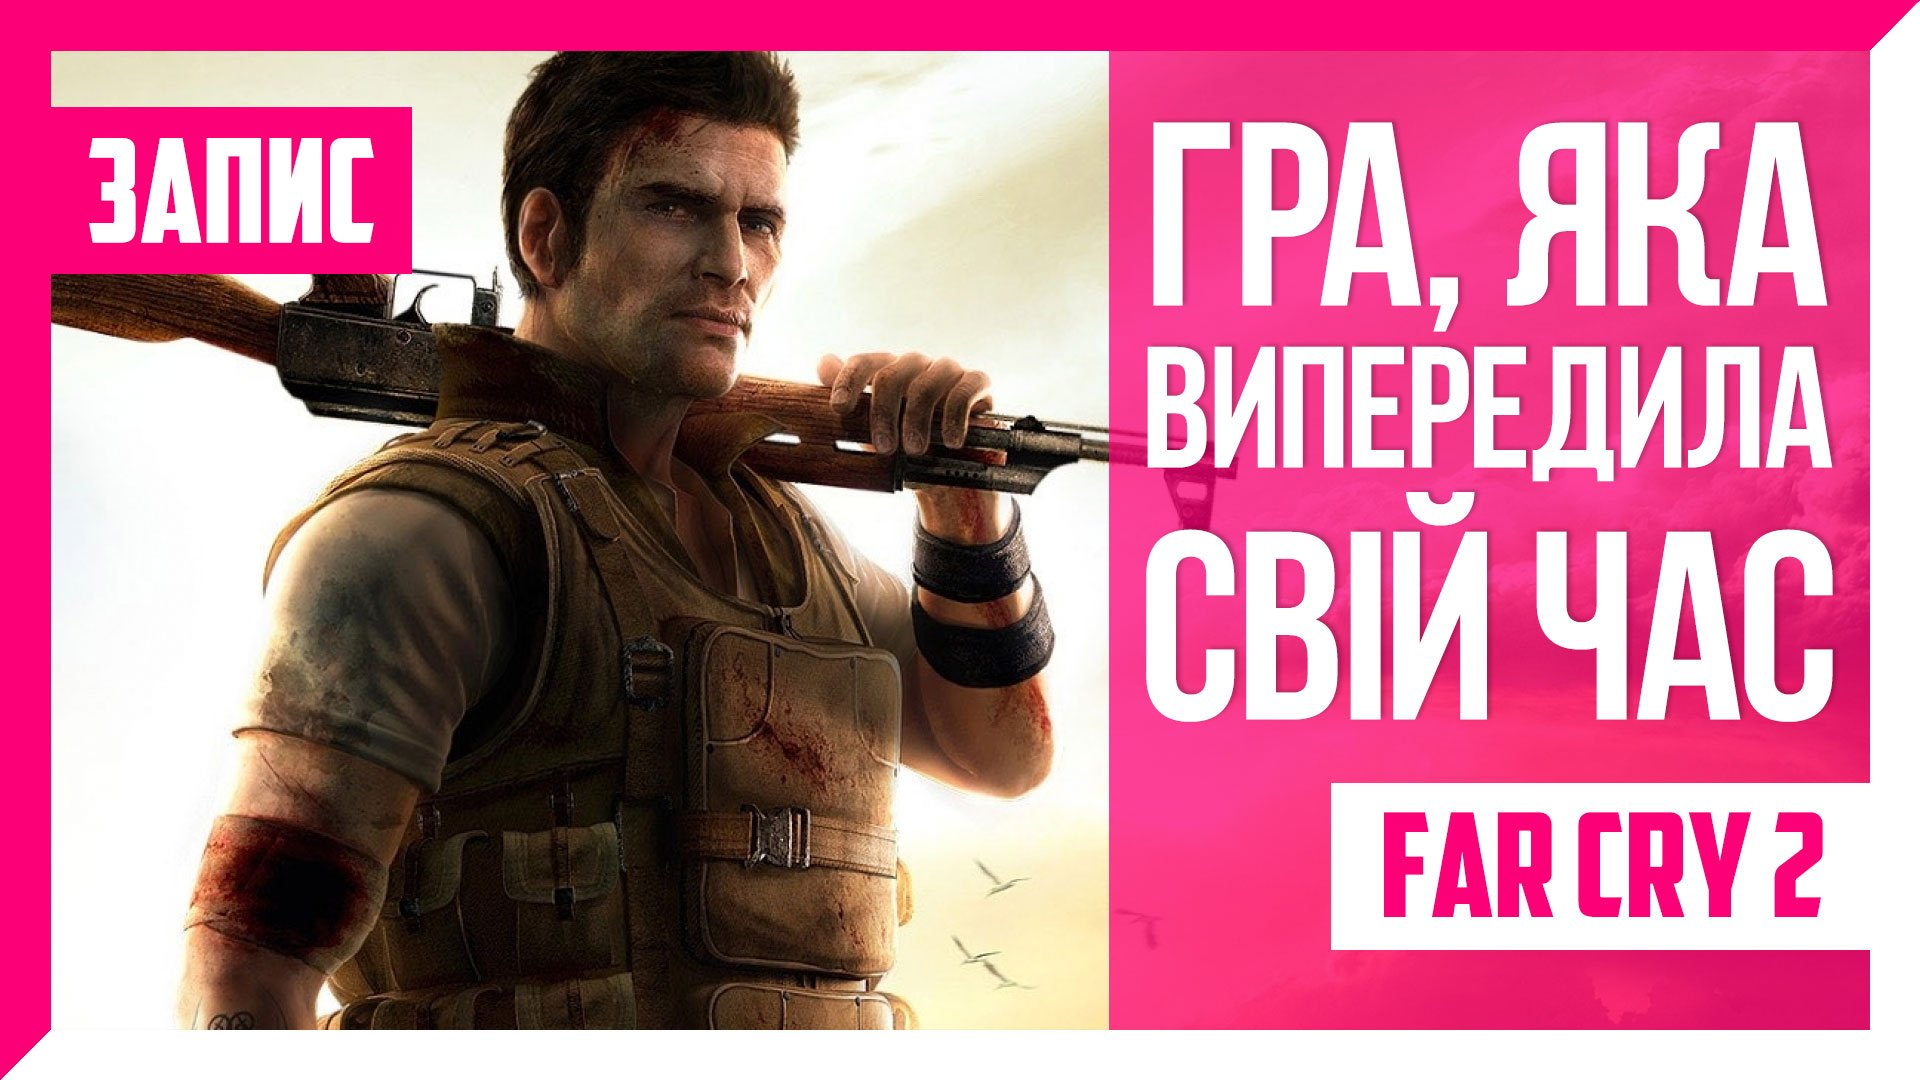 Far Cry 2. Стрімомарафон Far Cry #02 by @AbsoKulikov | ЗАПИС